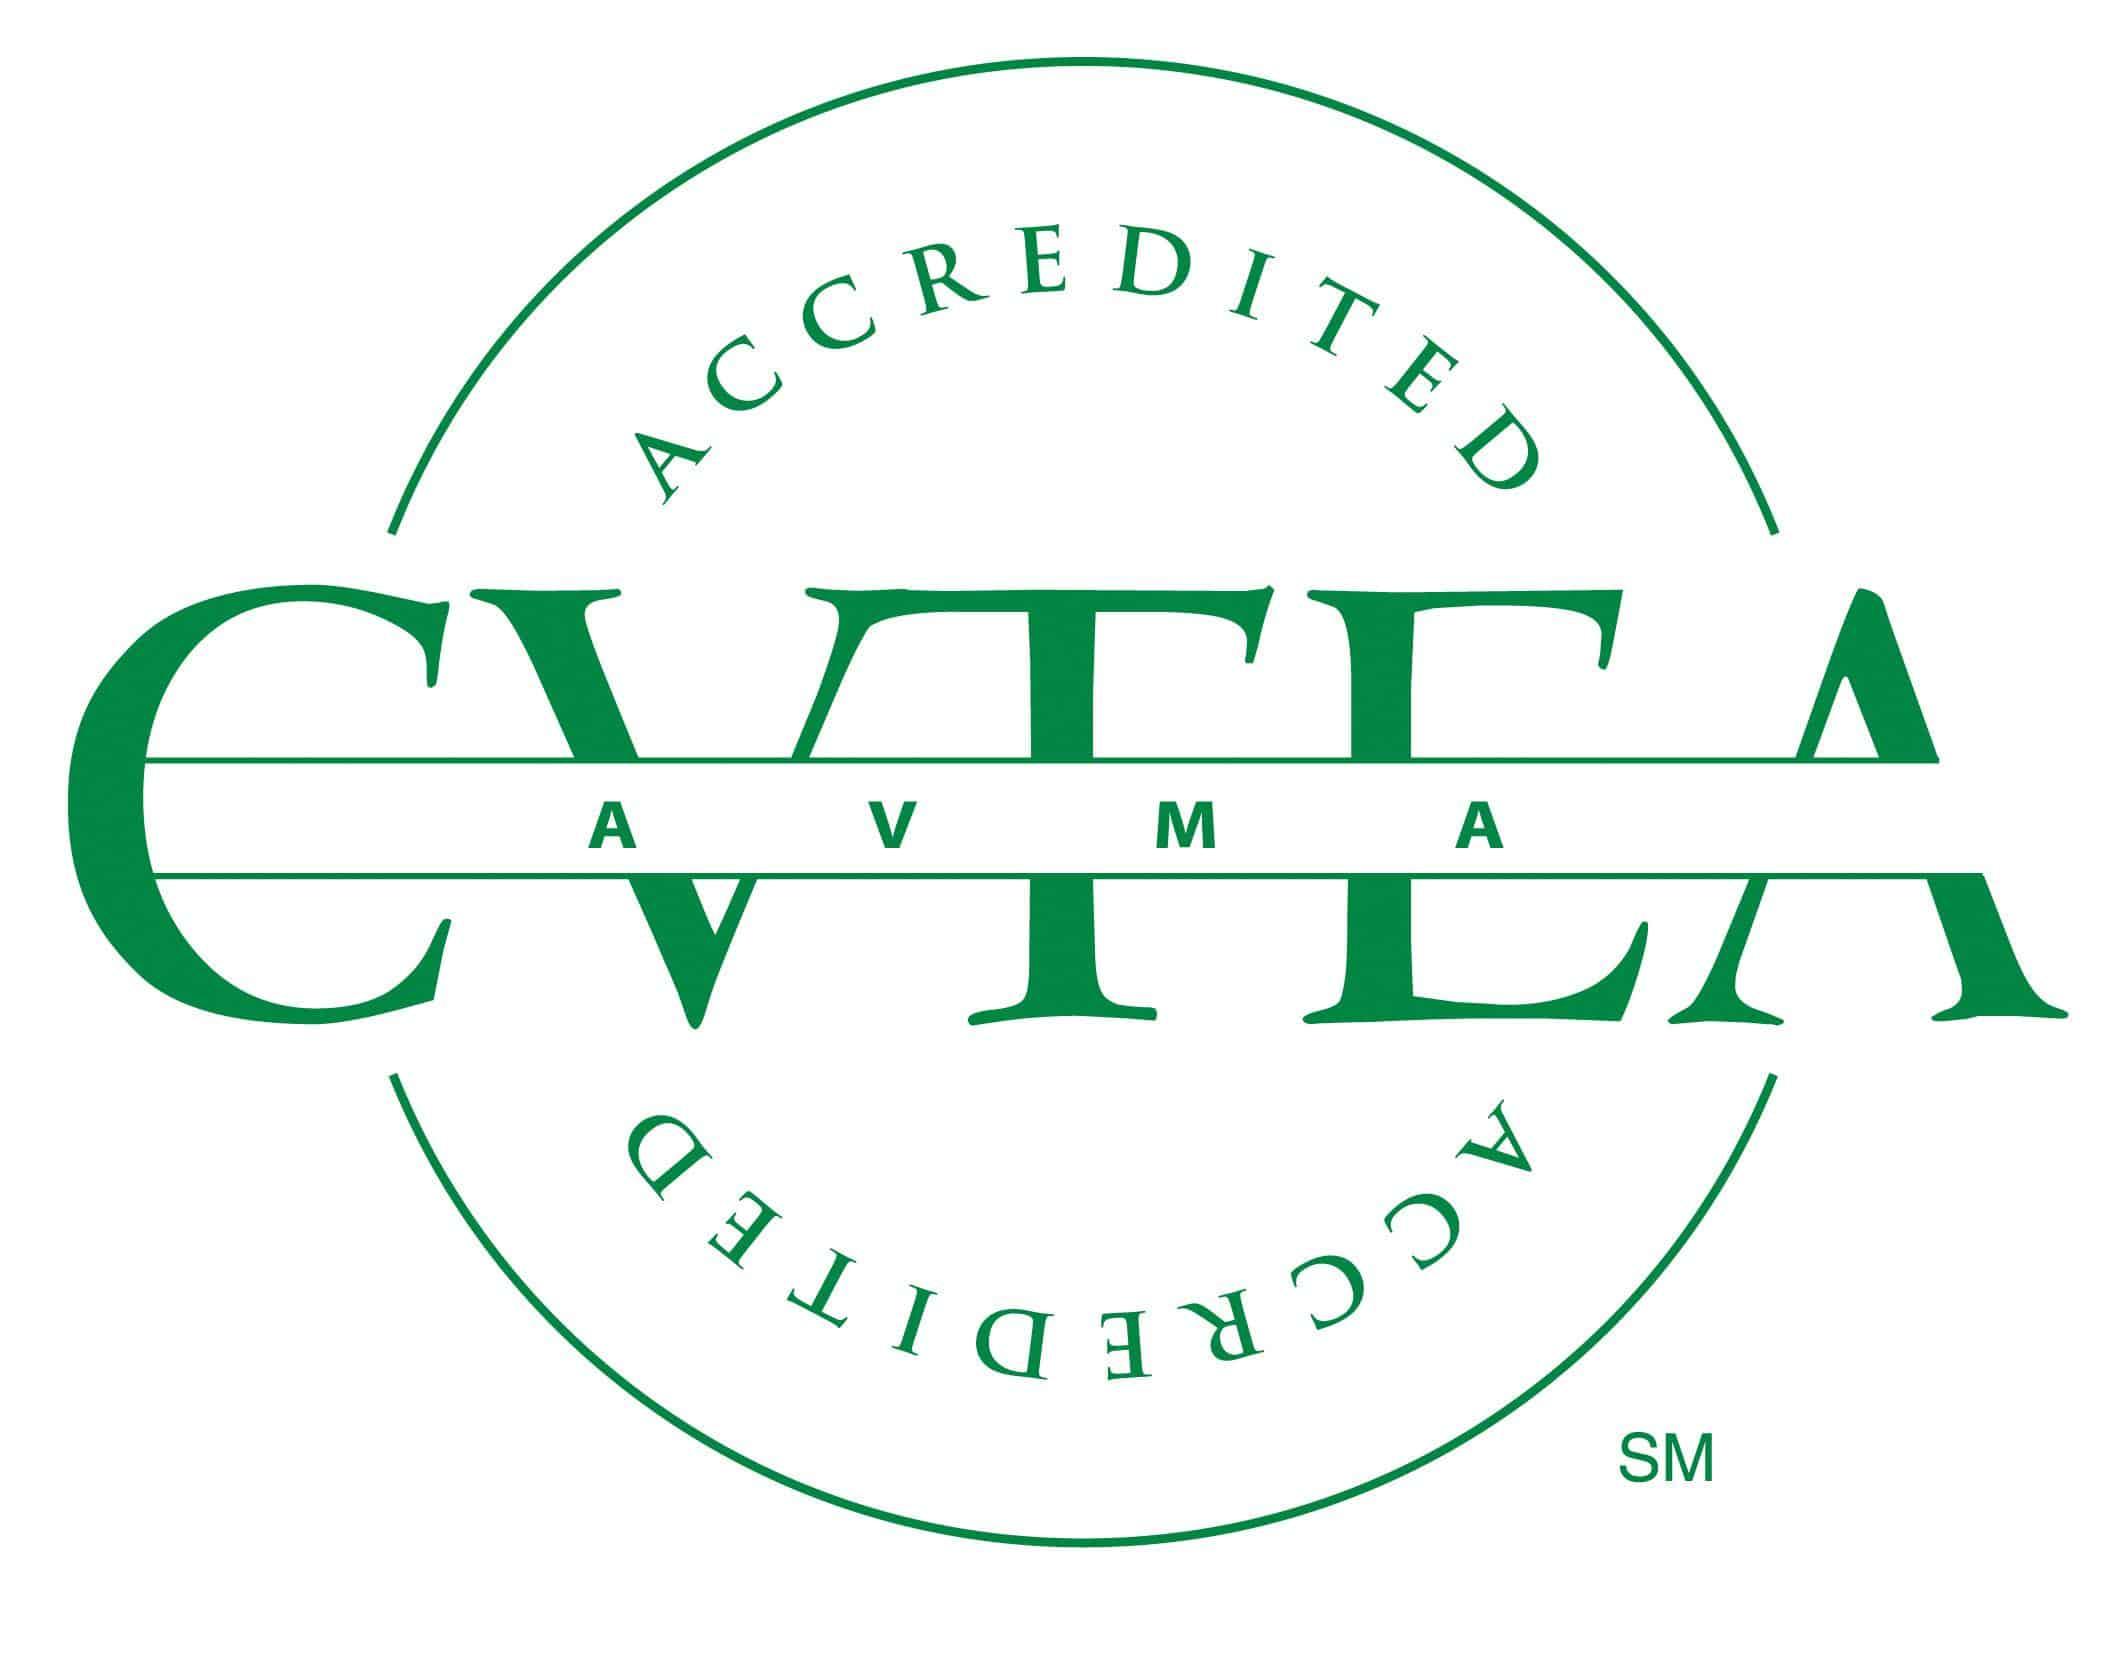 Associate of science in vet tech rvt stanbridge university accreditation xflitez Images